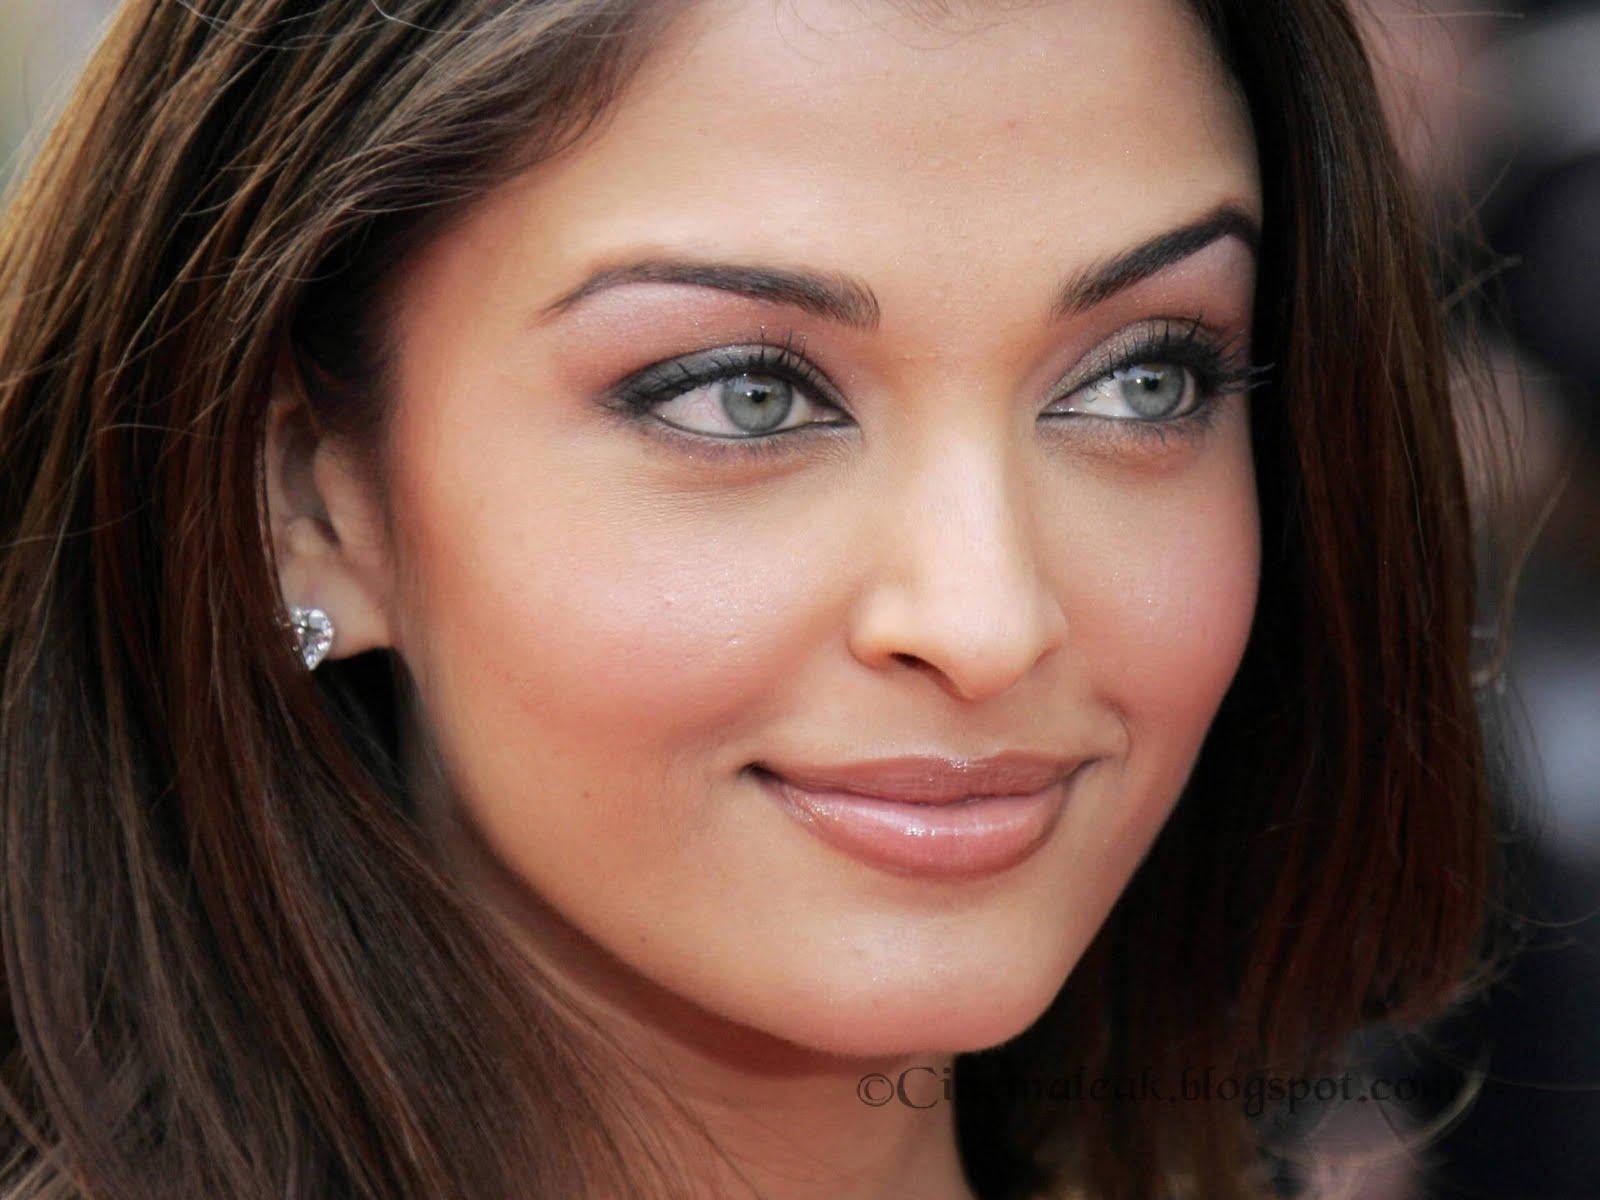 aishwarya rai beautiful in black wallpapers - 50 Beautiful Aishwarya Rai Wallpapers and Pics